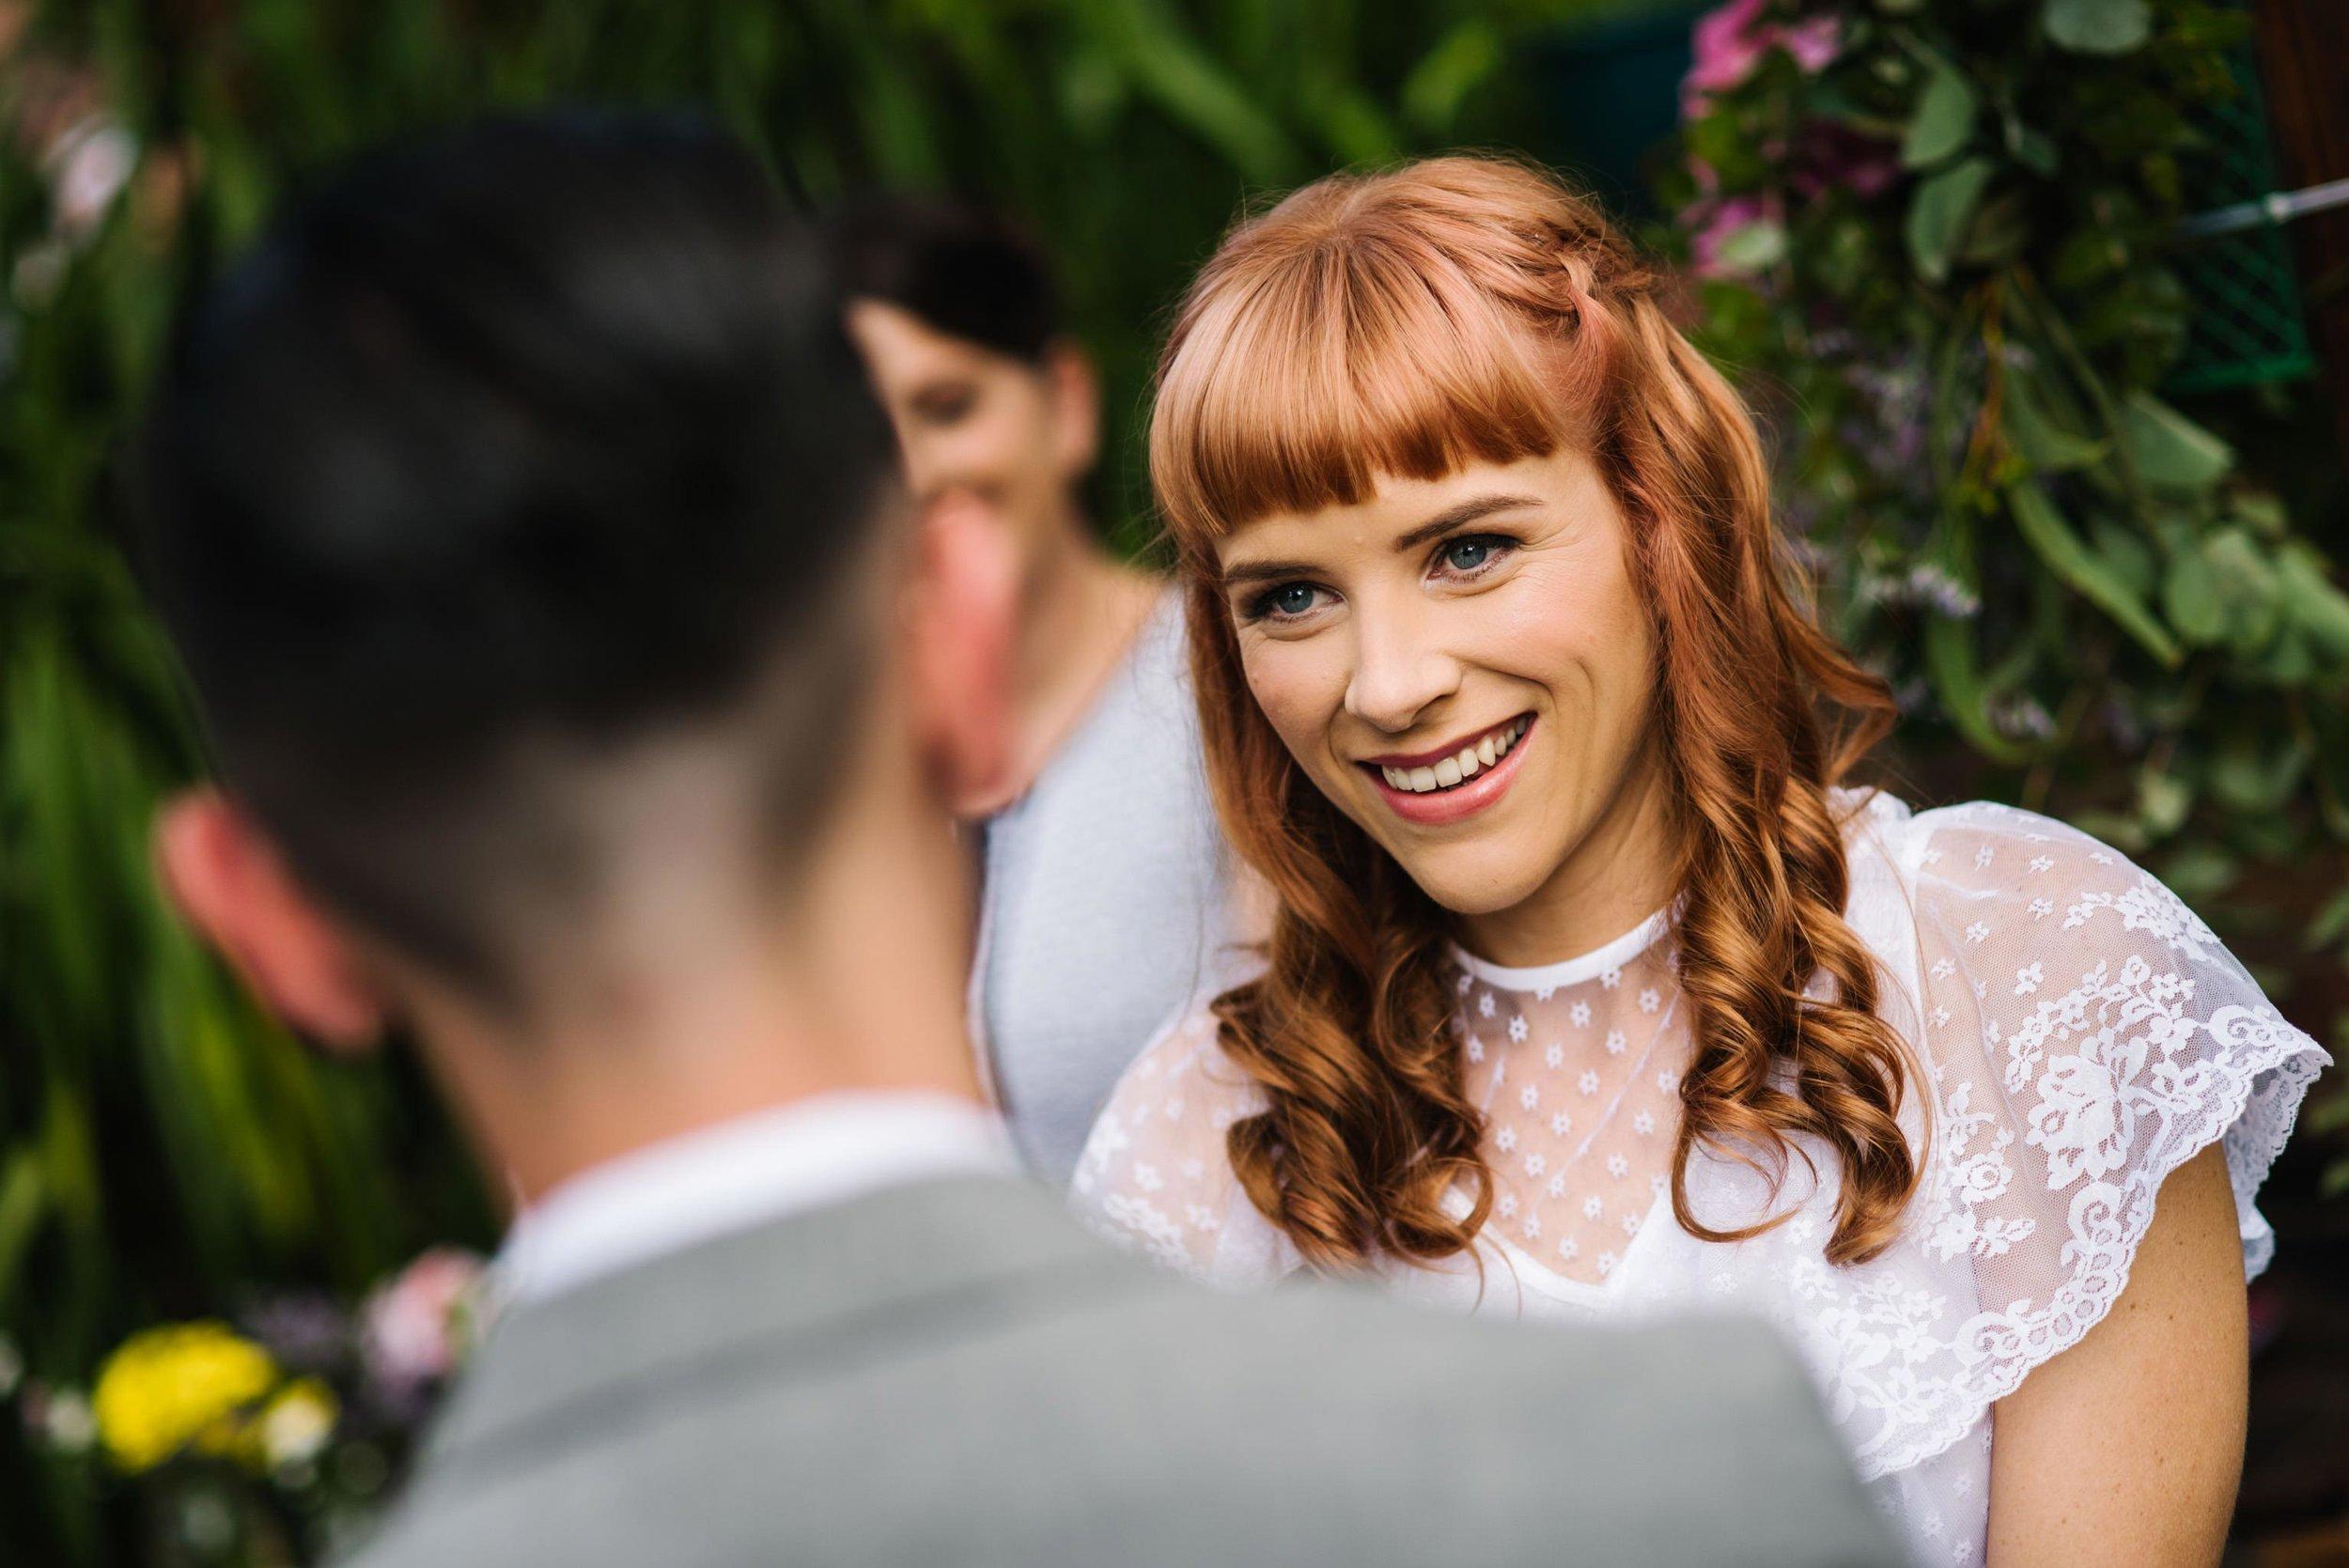 Bride smiles at groom during garden wedding ceremony in Sydney